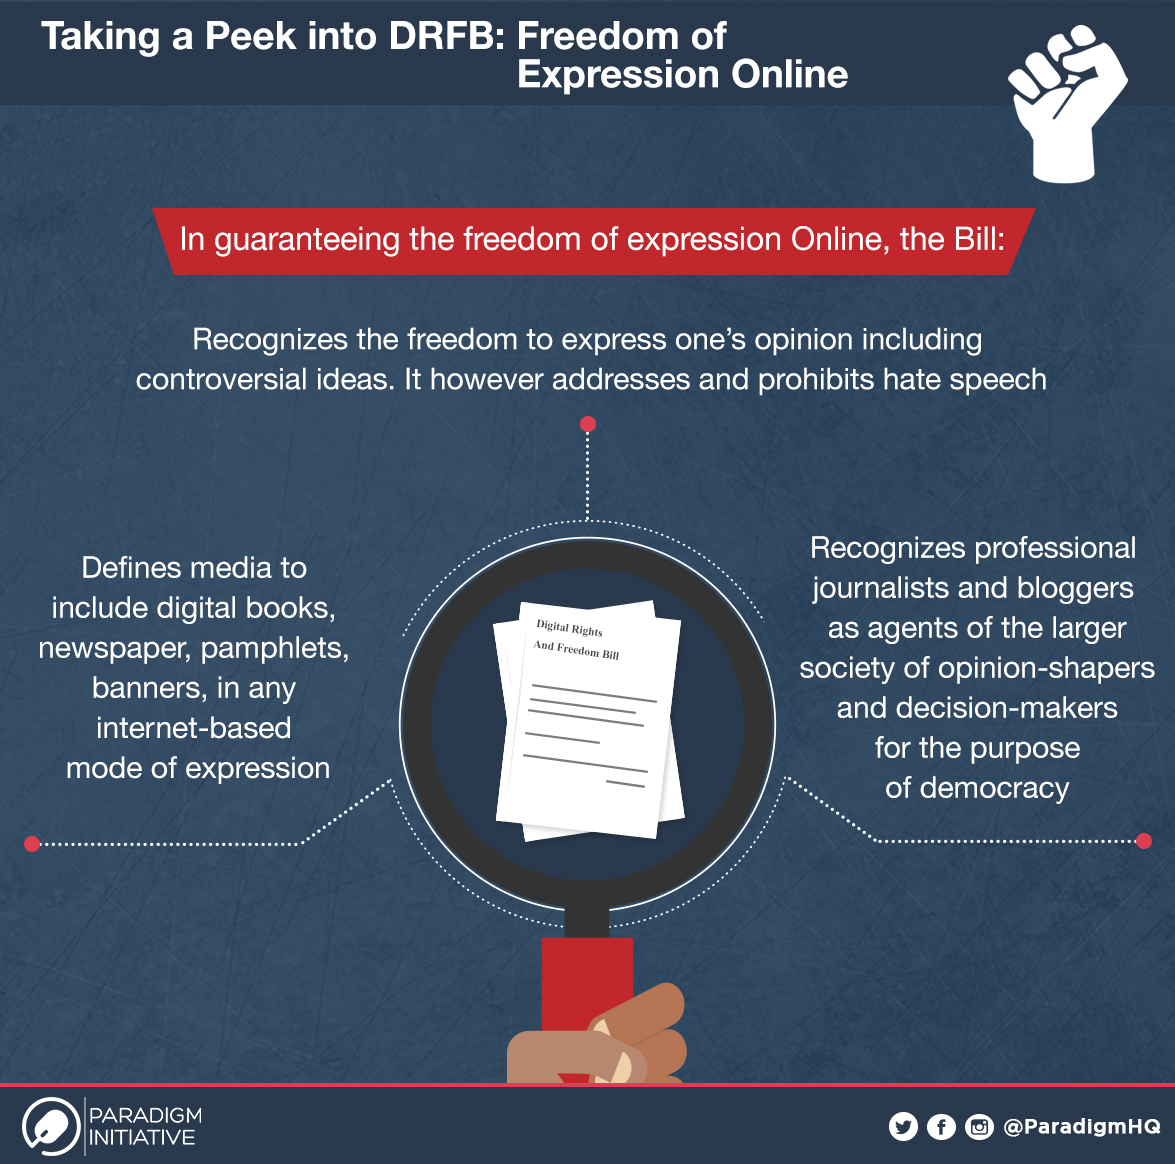 Shaping Nigeria's Digital Future through Positive Legislation